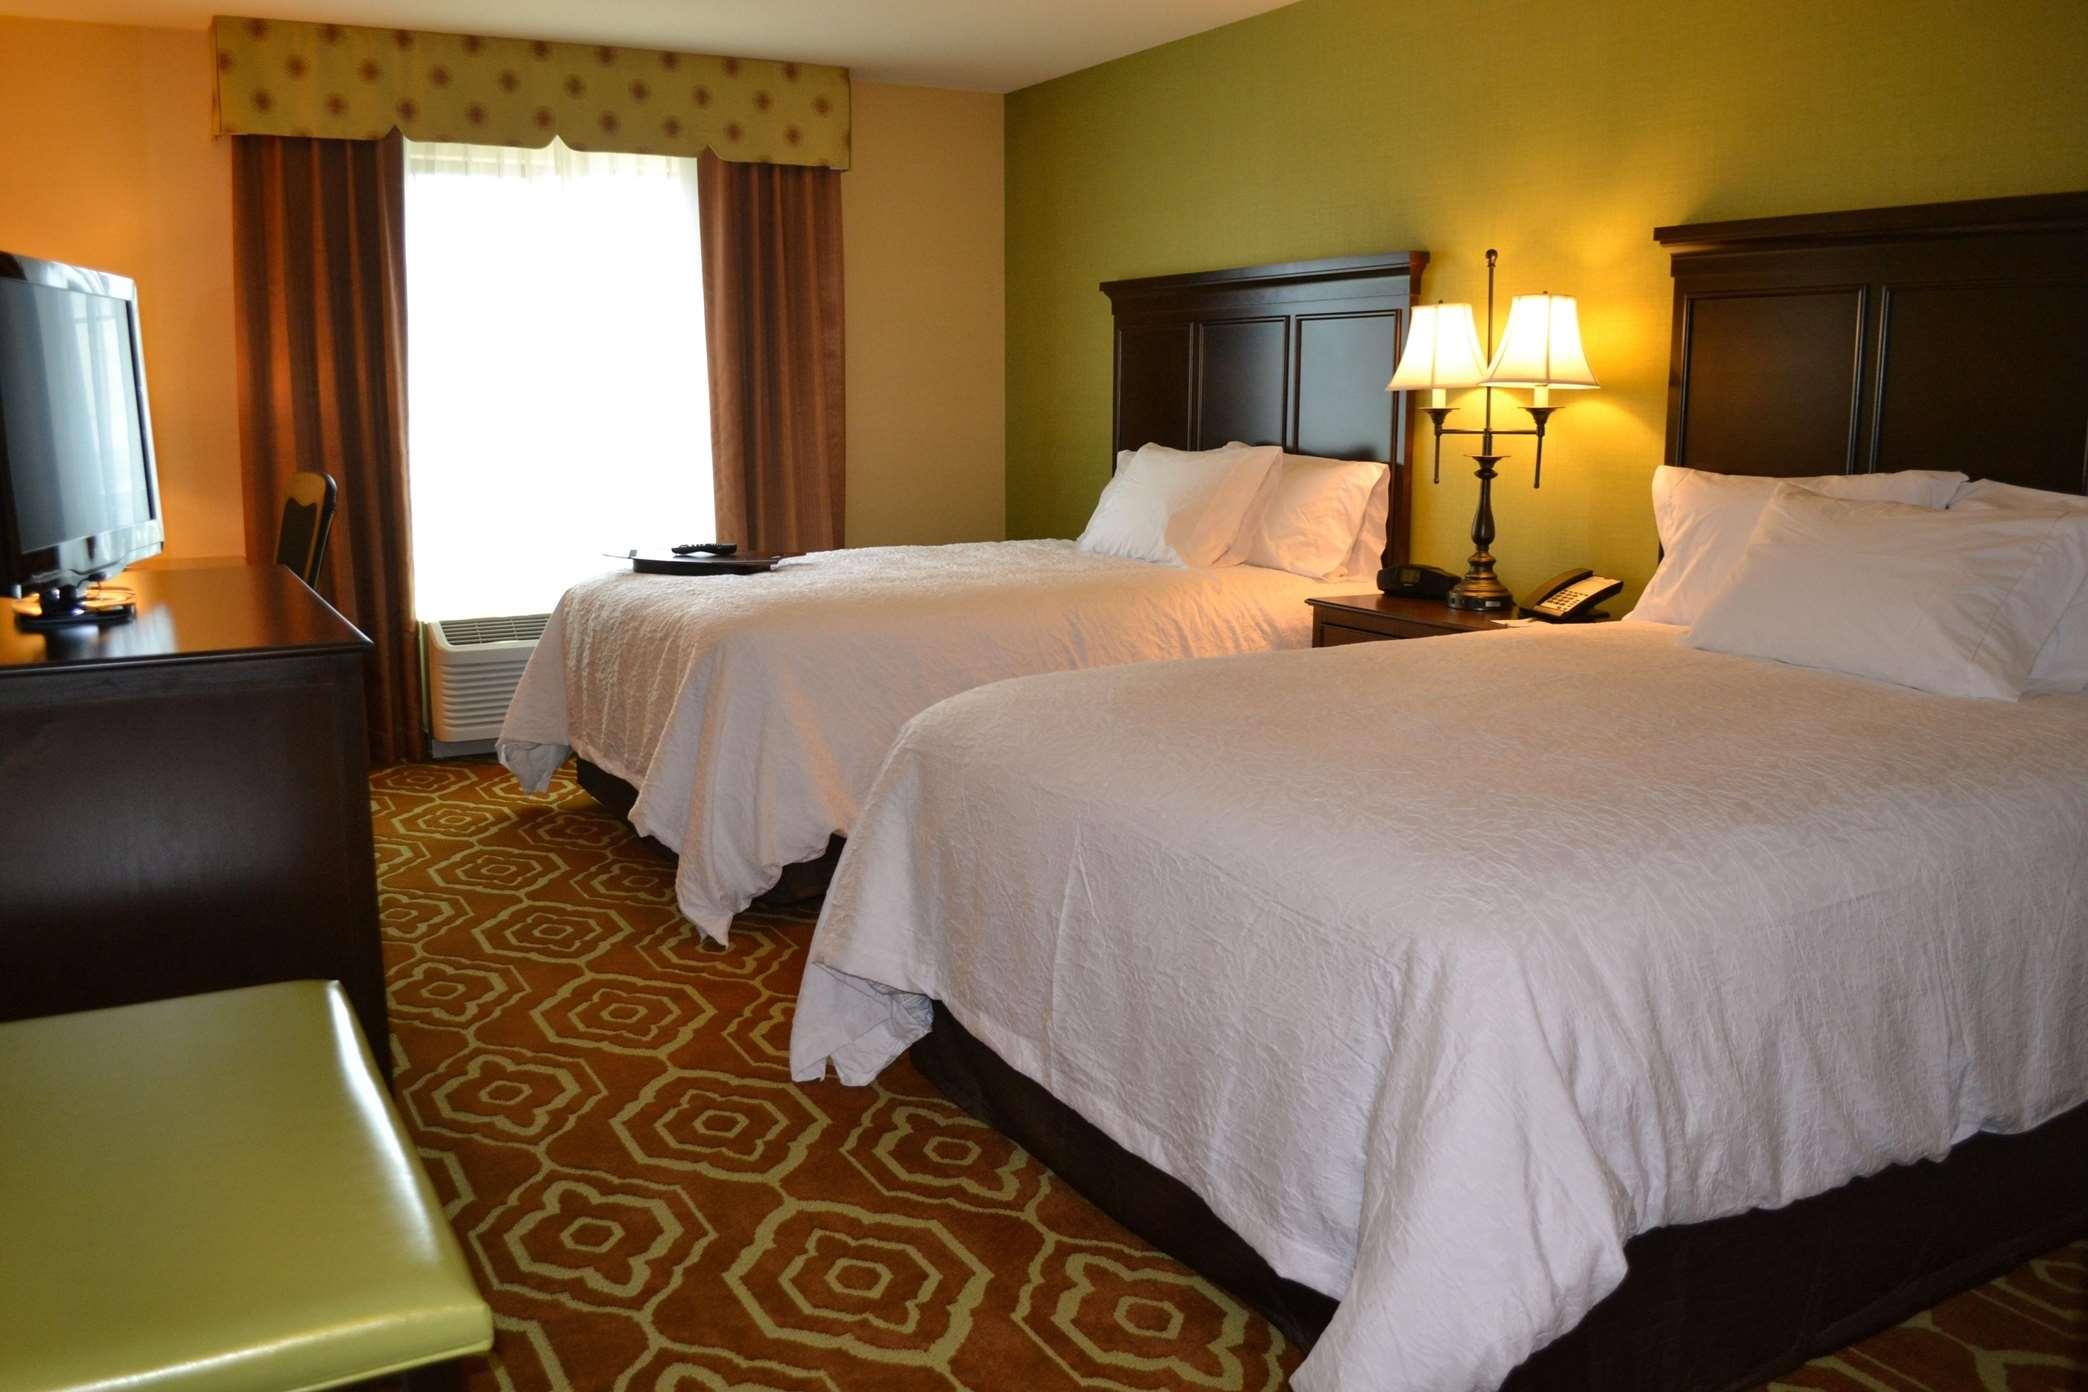 Hampton Inn & Suites San Luis Obispo image 12